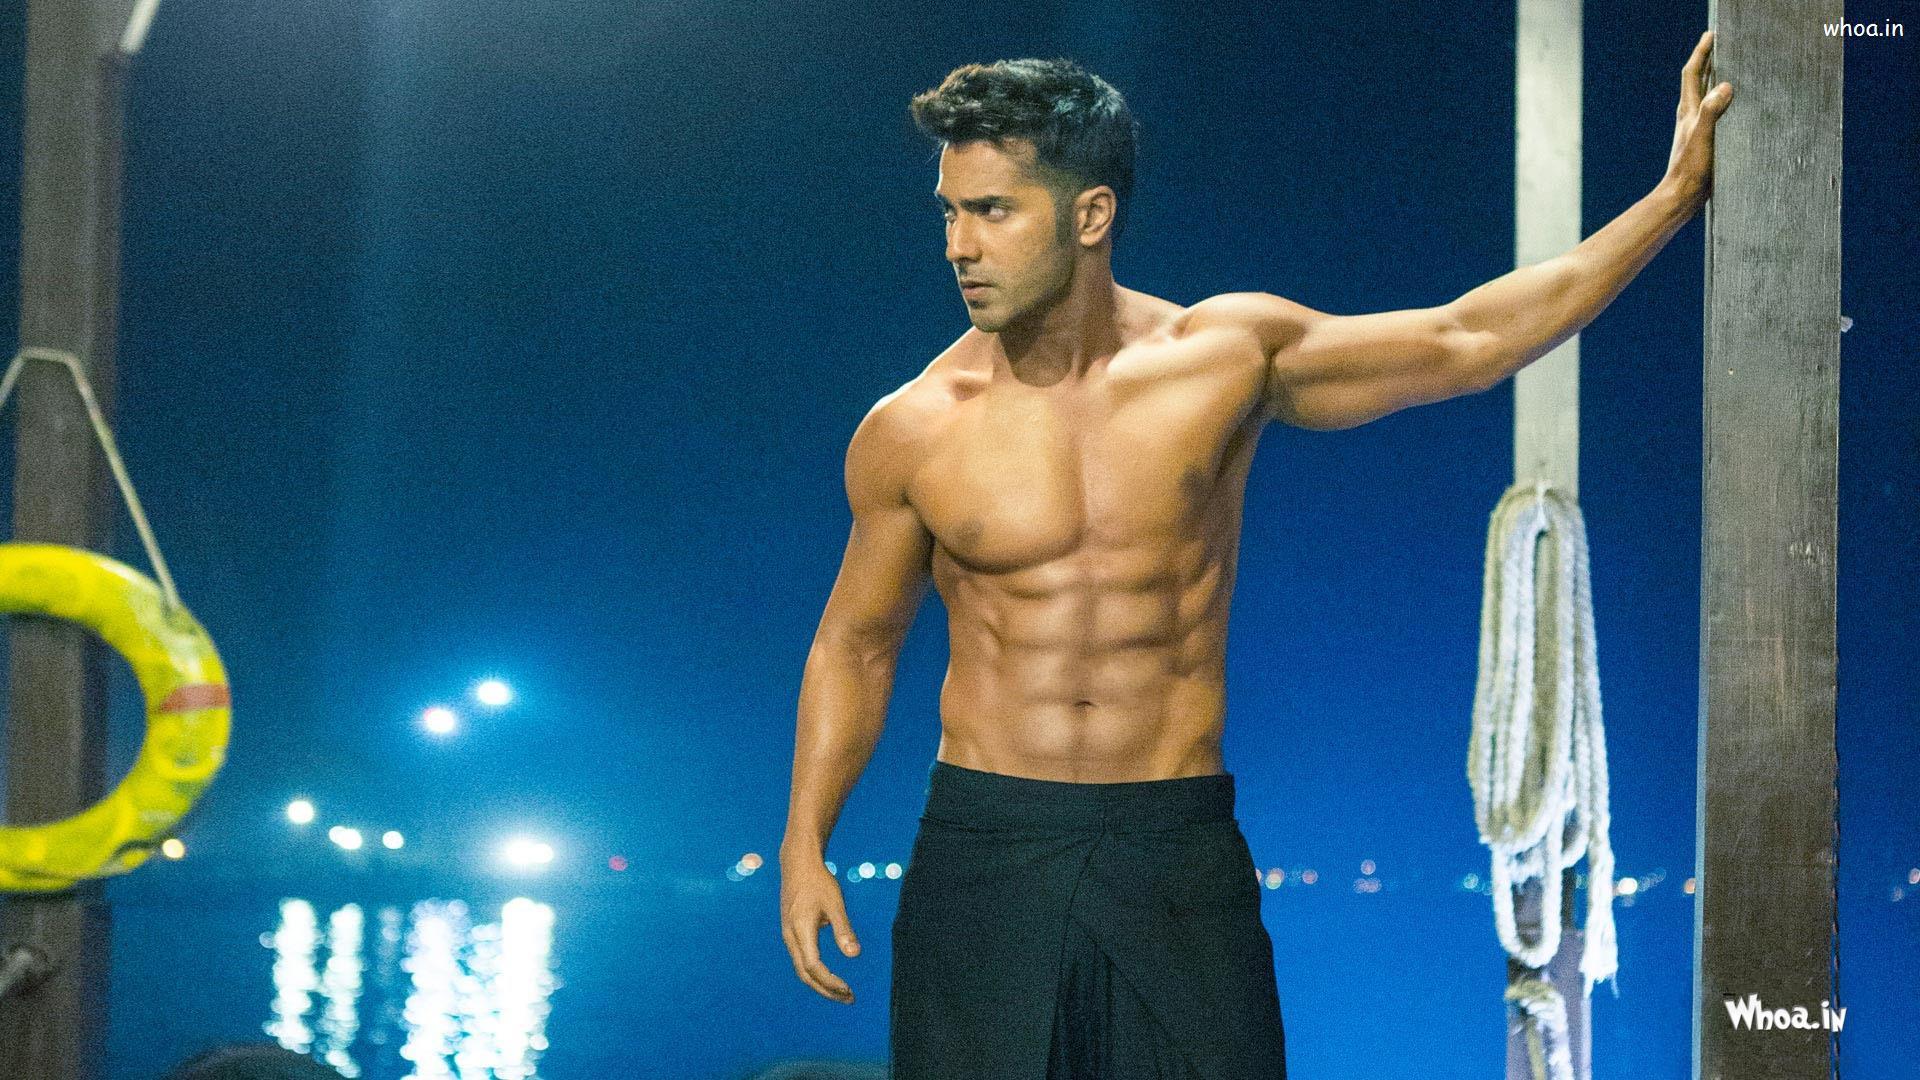 http://uupload.ir/files/eivv_abcd-2-varun-dhavan-as-a-suresh-shirtless-hd-movies-wallpaper.jpg